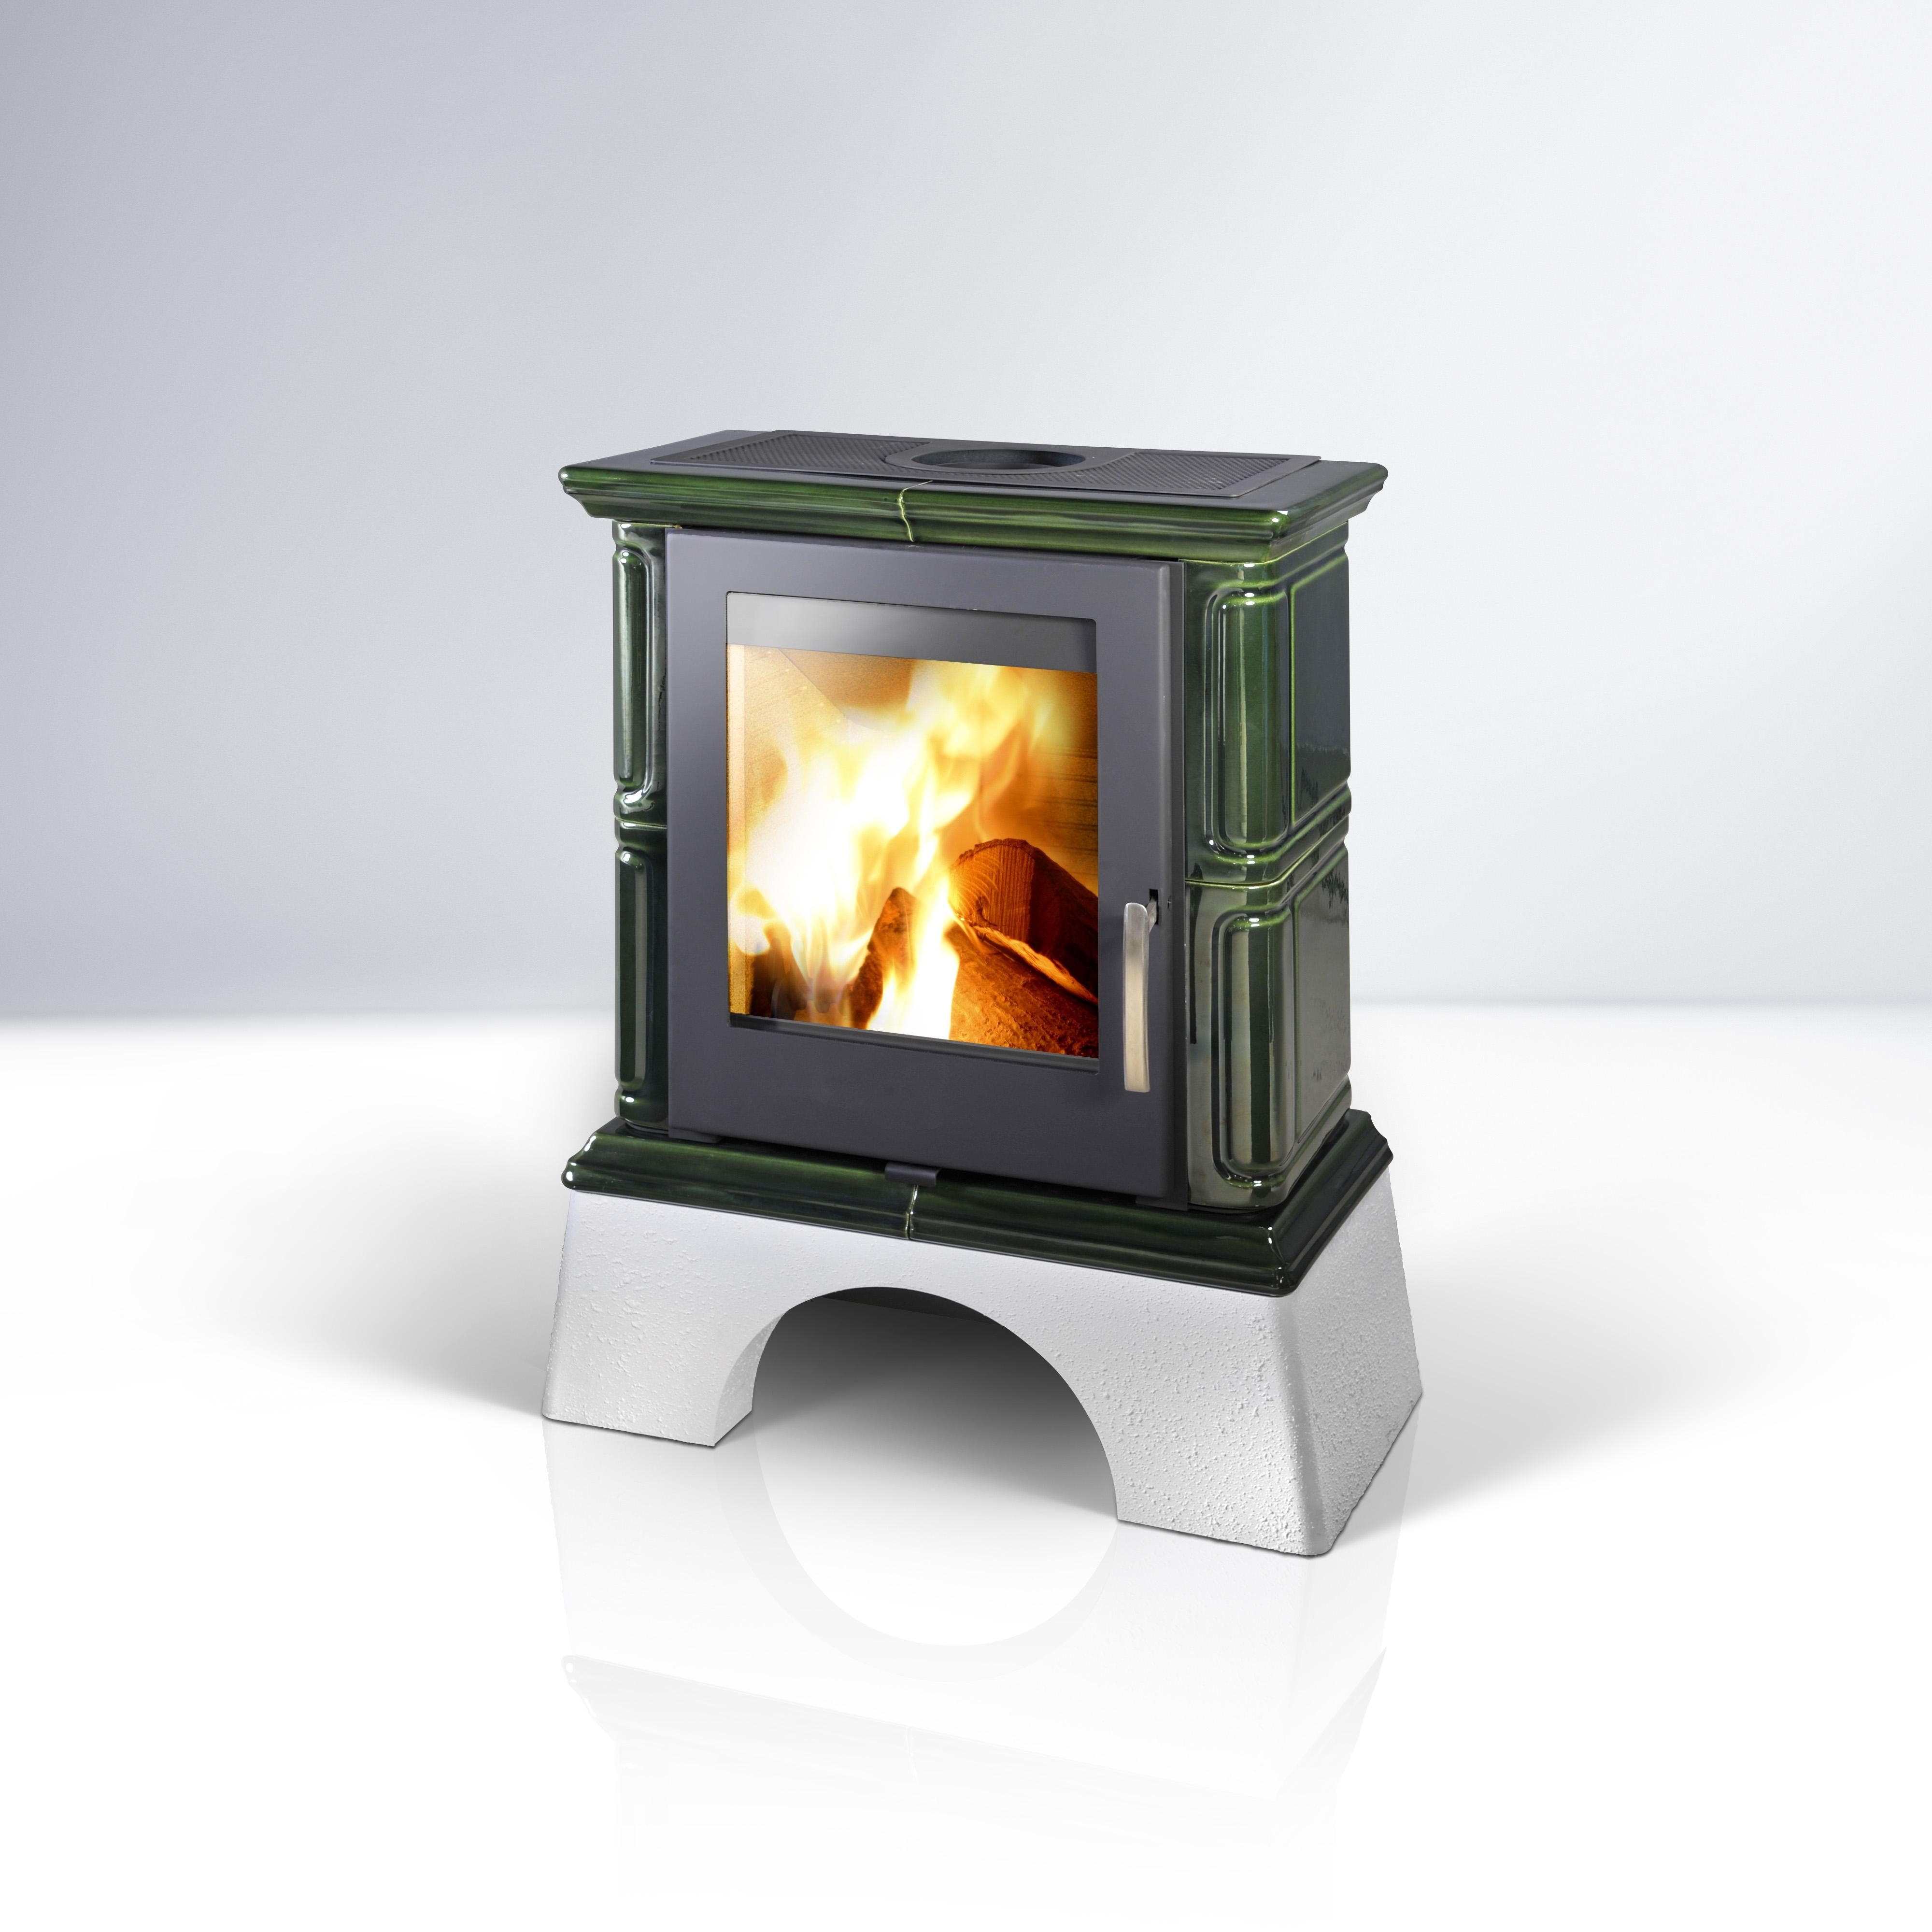 poele a bois thorma obtenez des id es de. Black Bedroom Furniture Sets. Home Design Ideas